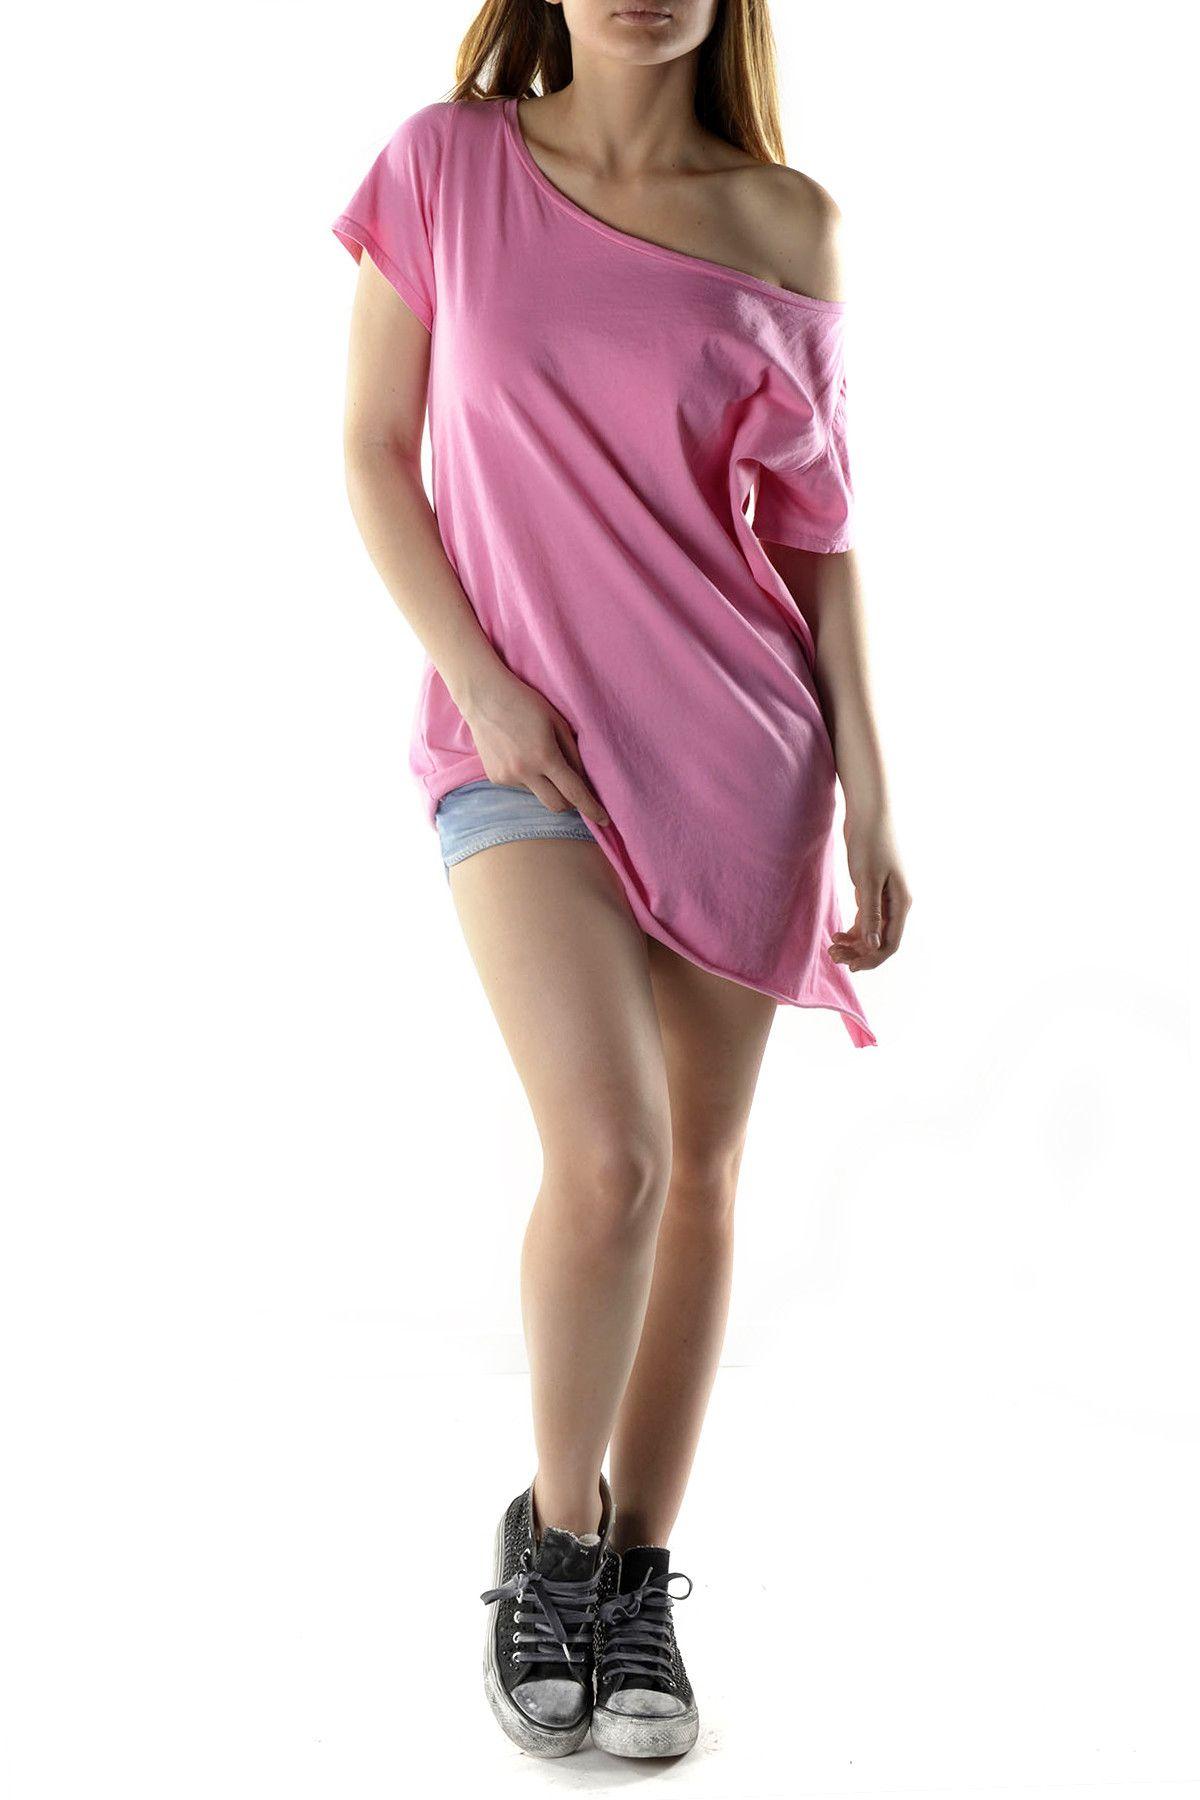 525 Women's T-Shirt In Pink